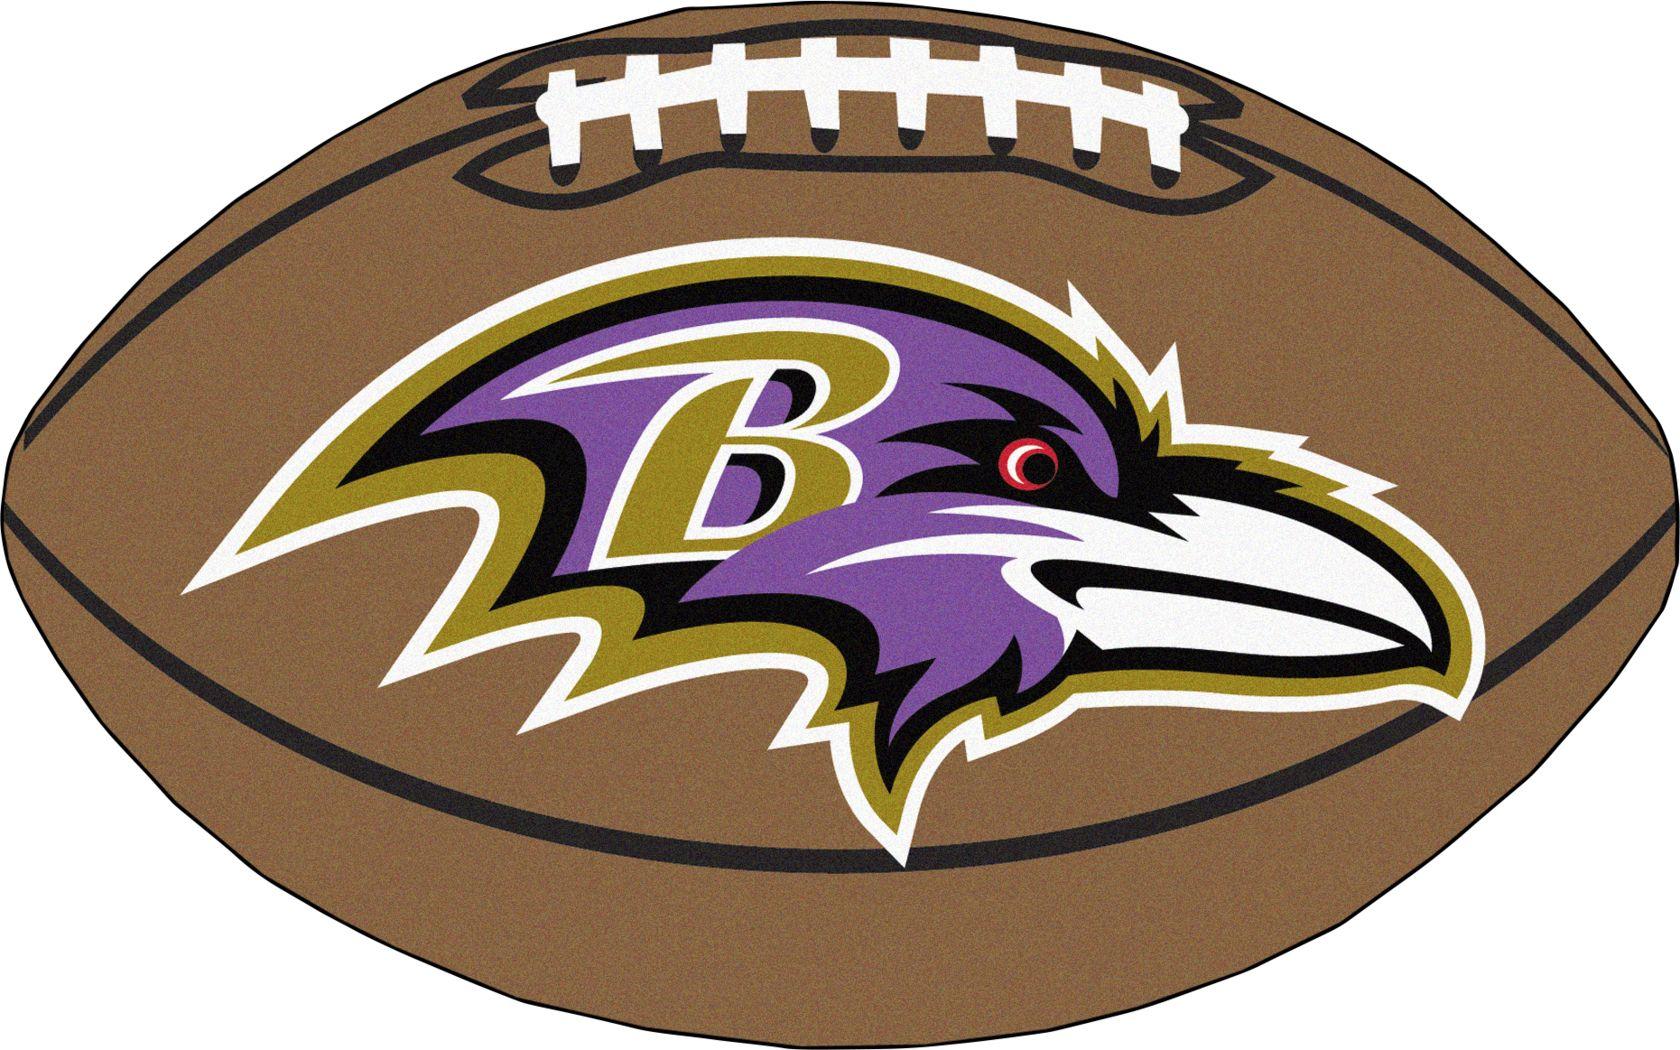 "NFL Football Mascot Baltimore Ravens 1'6"" x 1'10"" Rug"